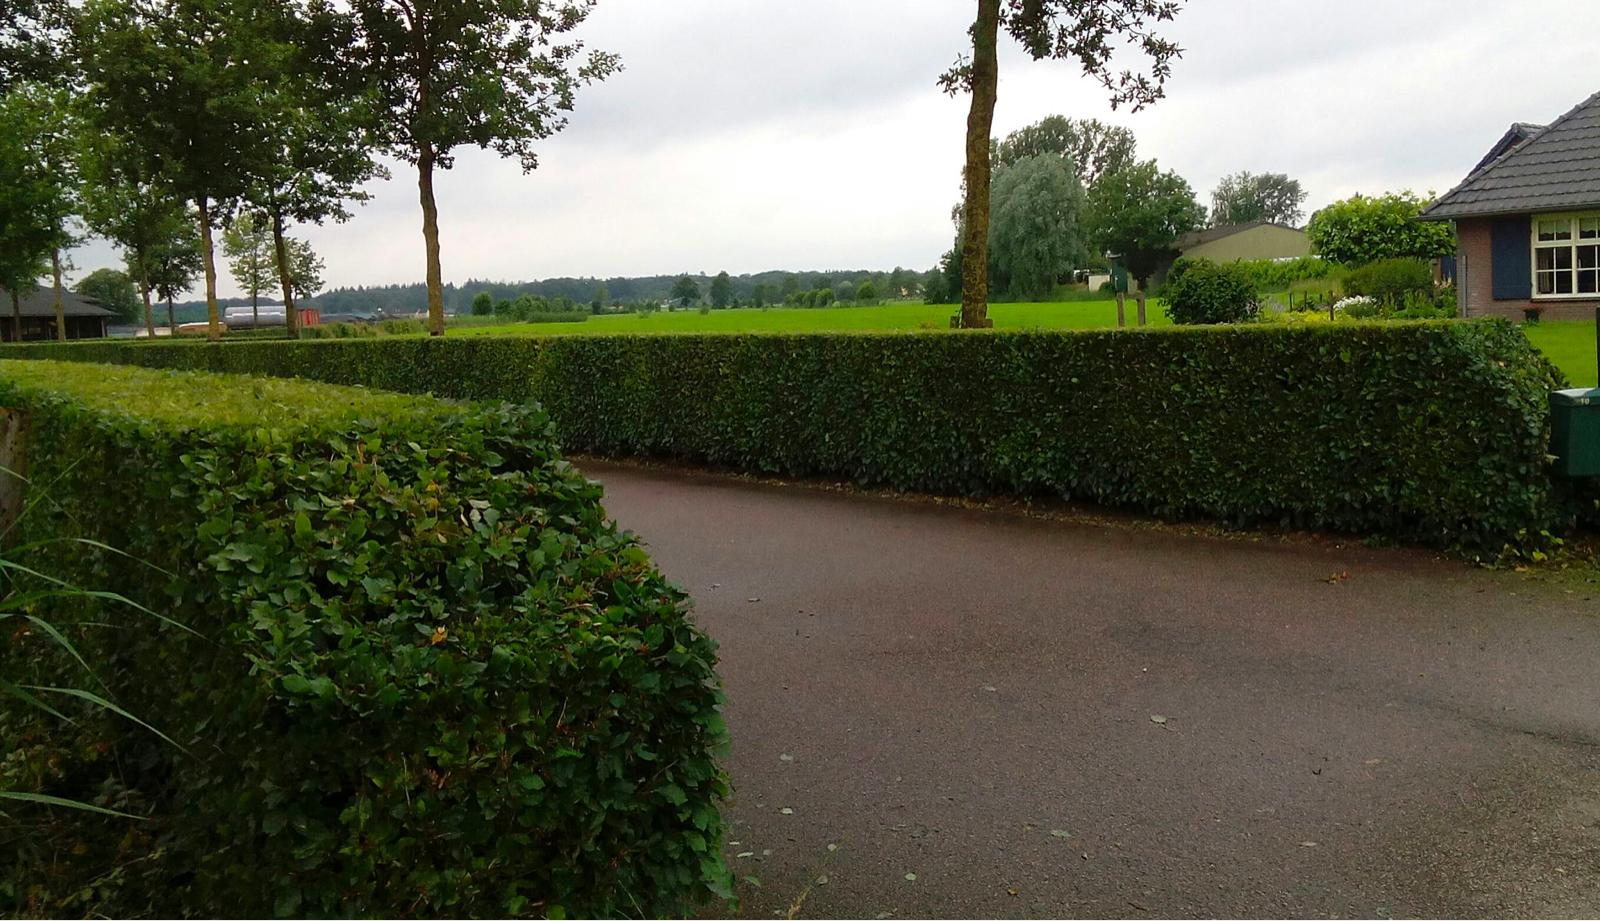 Hovenier Woudenberg